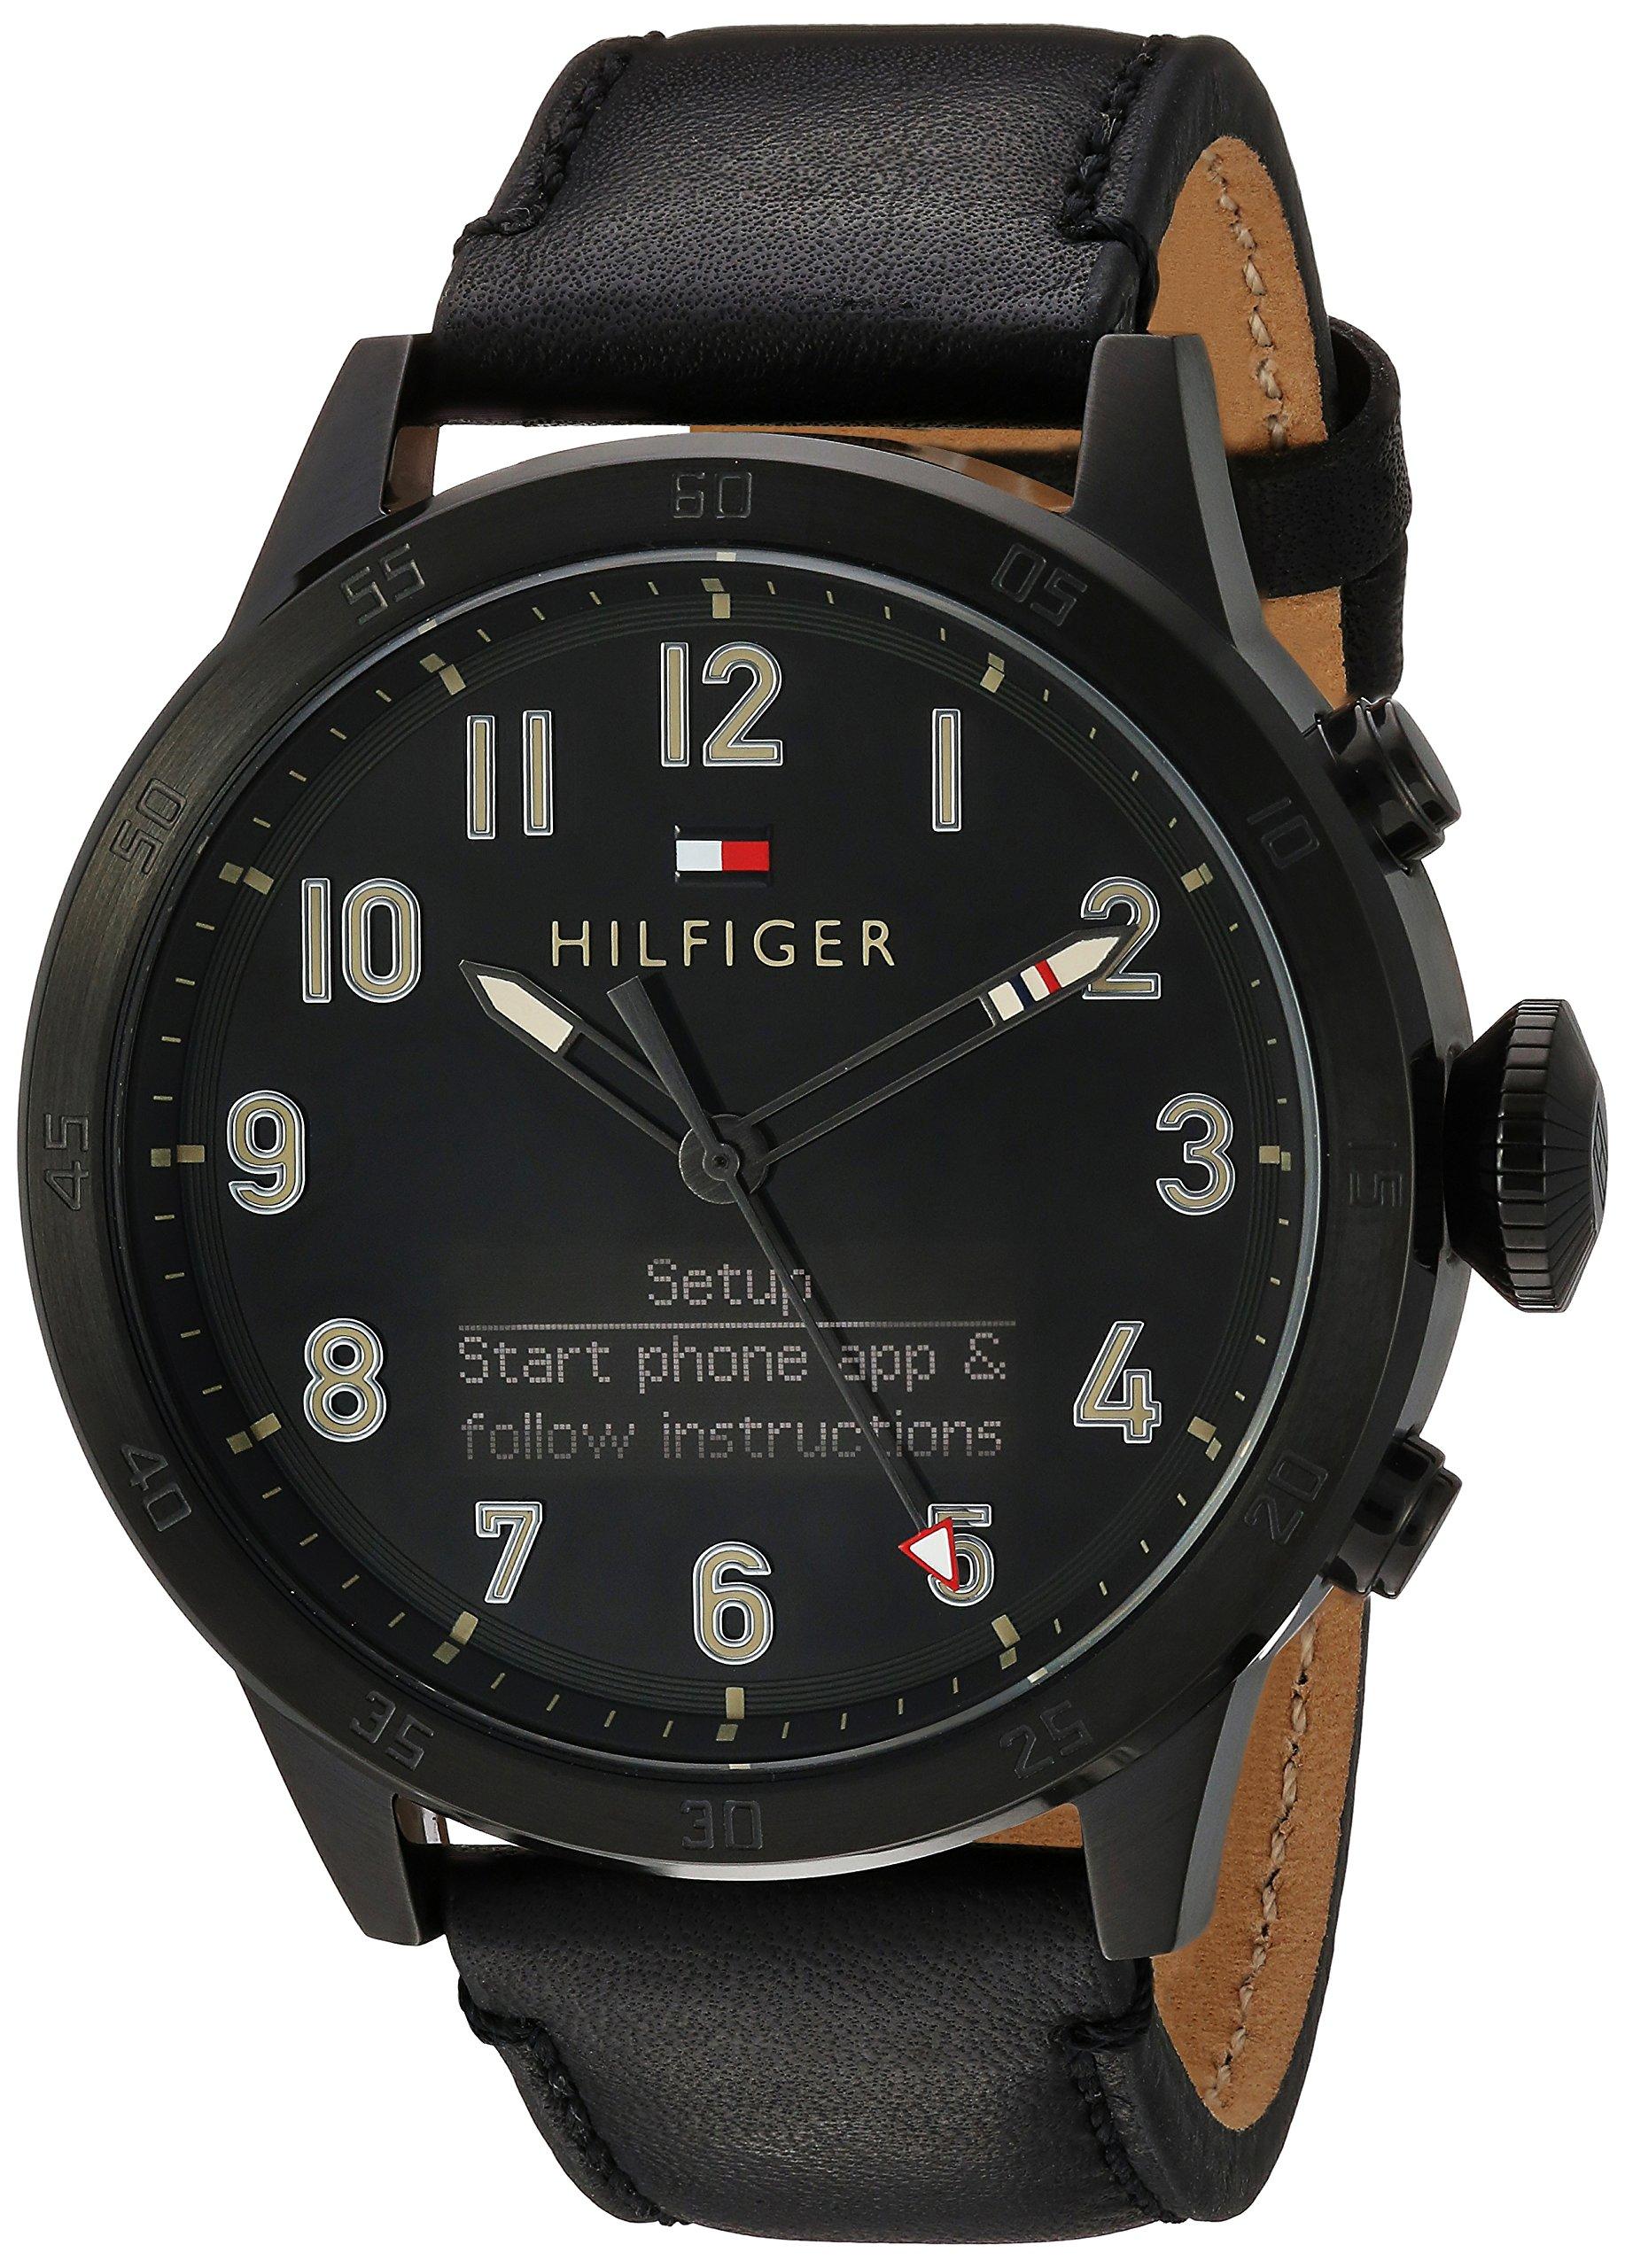 Tommy Hilfiger Men's 'TH 24/7' Quartz Resin and Leather Smart Watch, Color: Black (Model: 1791301) by Tommy Hilfiger